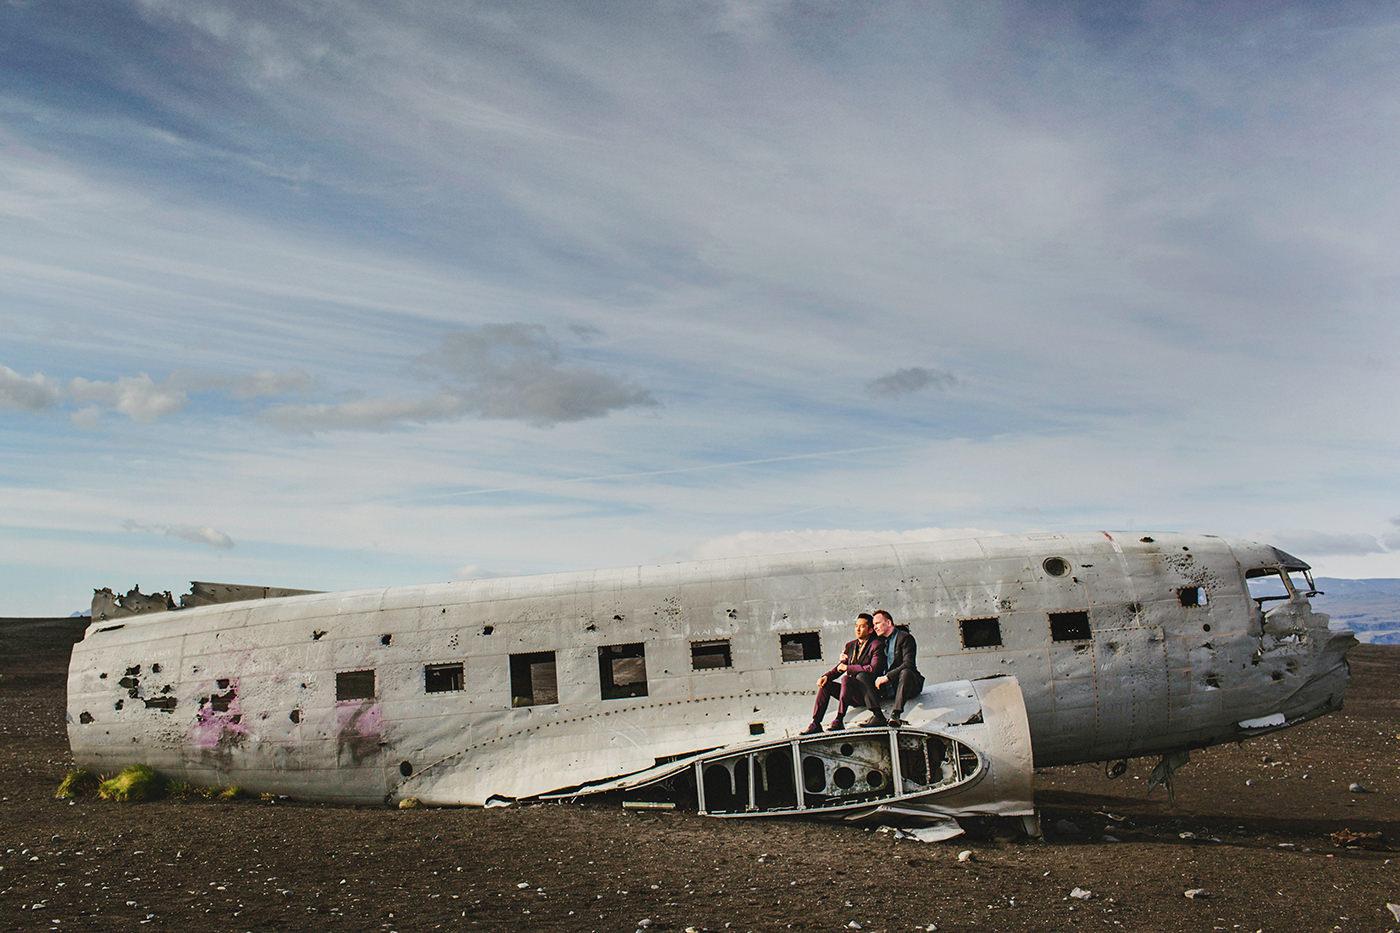 Same sex wedding portrait from abandoned plane crash site in Iceland